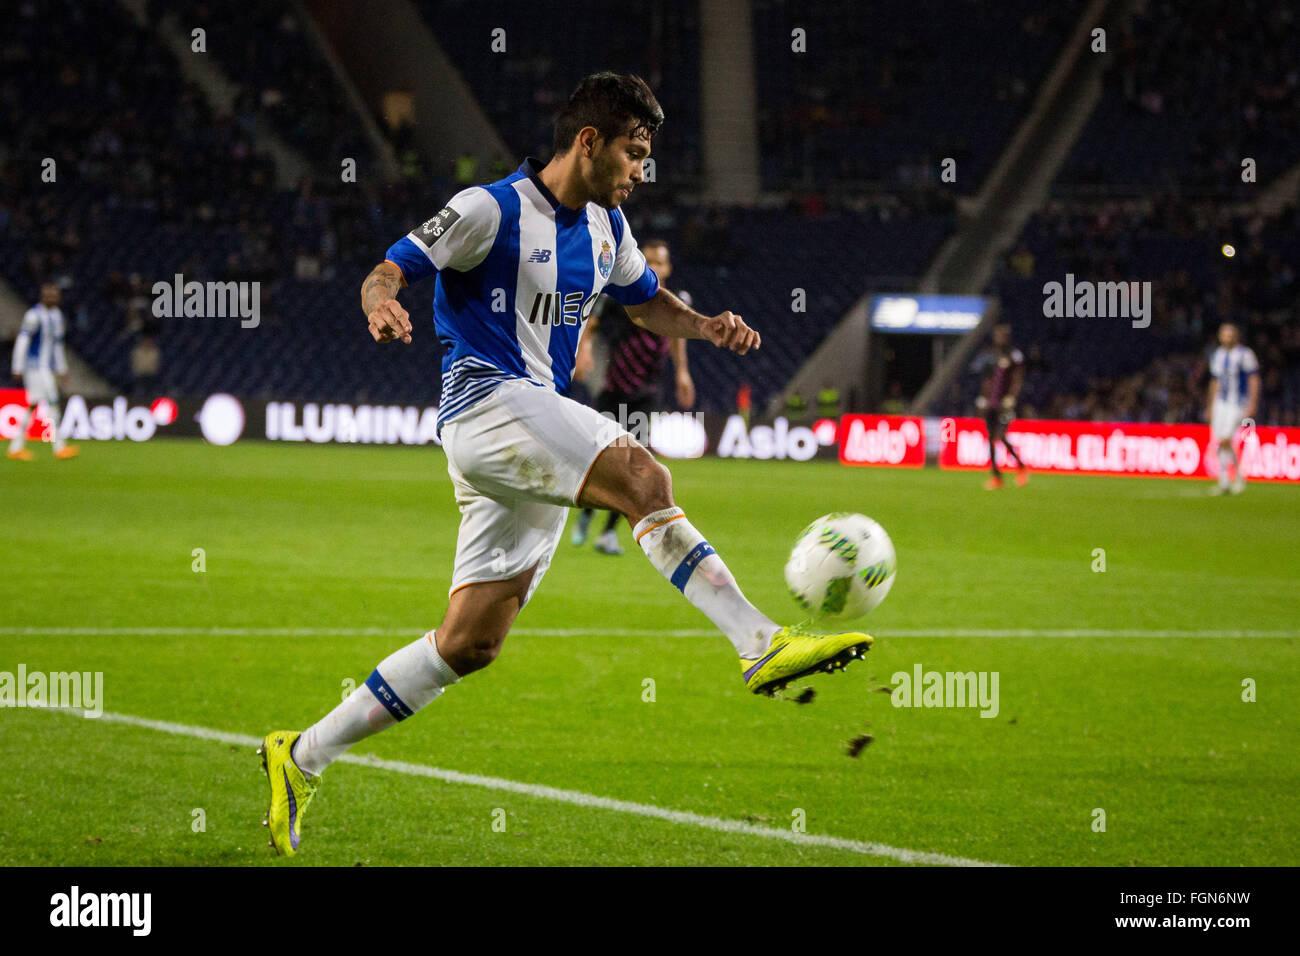 Dragon Stadium, Portugal. 21st February, 2016. FC Porto's player Corona during the Premier League 2015/16 match - Stock Image